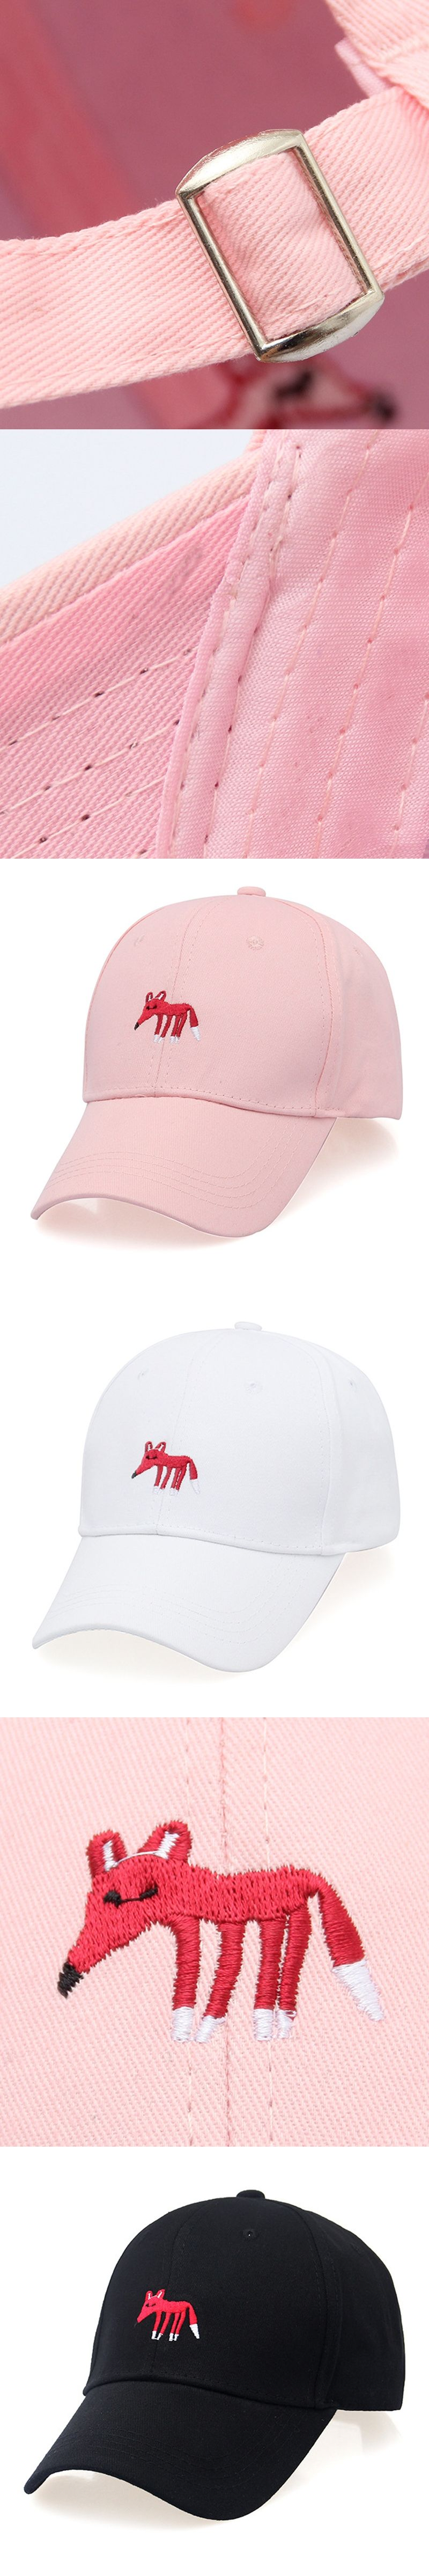 3a1b36e492b Women s Cap Snapback Pink black white Cactus Fox Embroidery Dad hat Men s  Summer Baseball Caps Hip